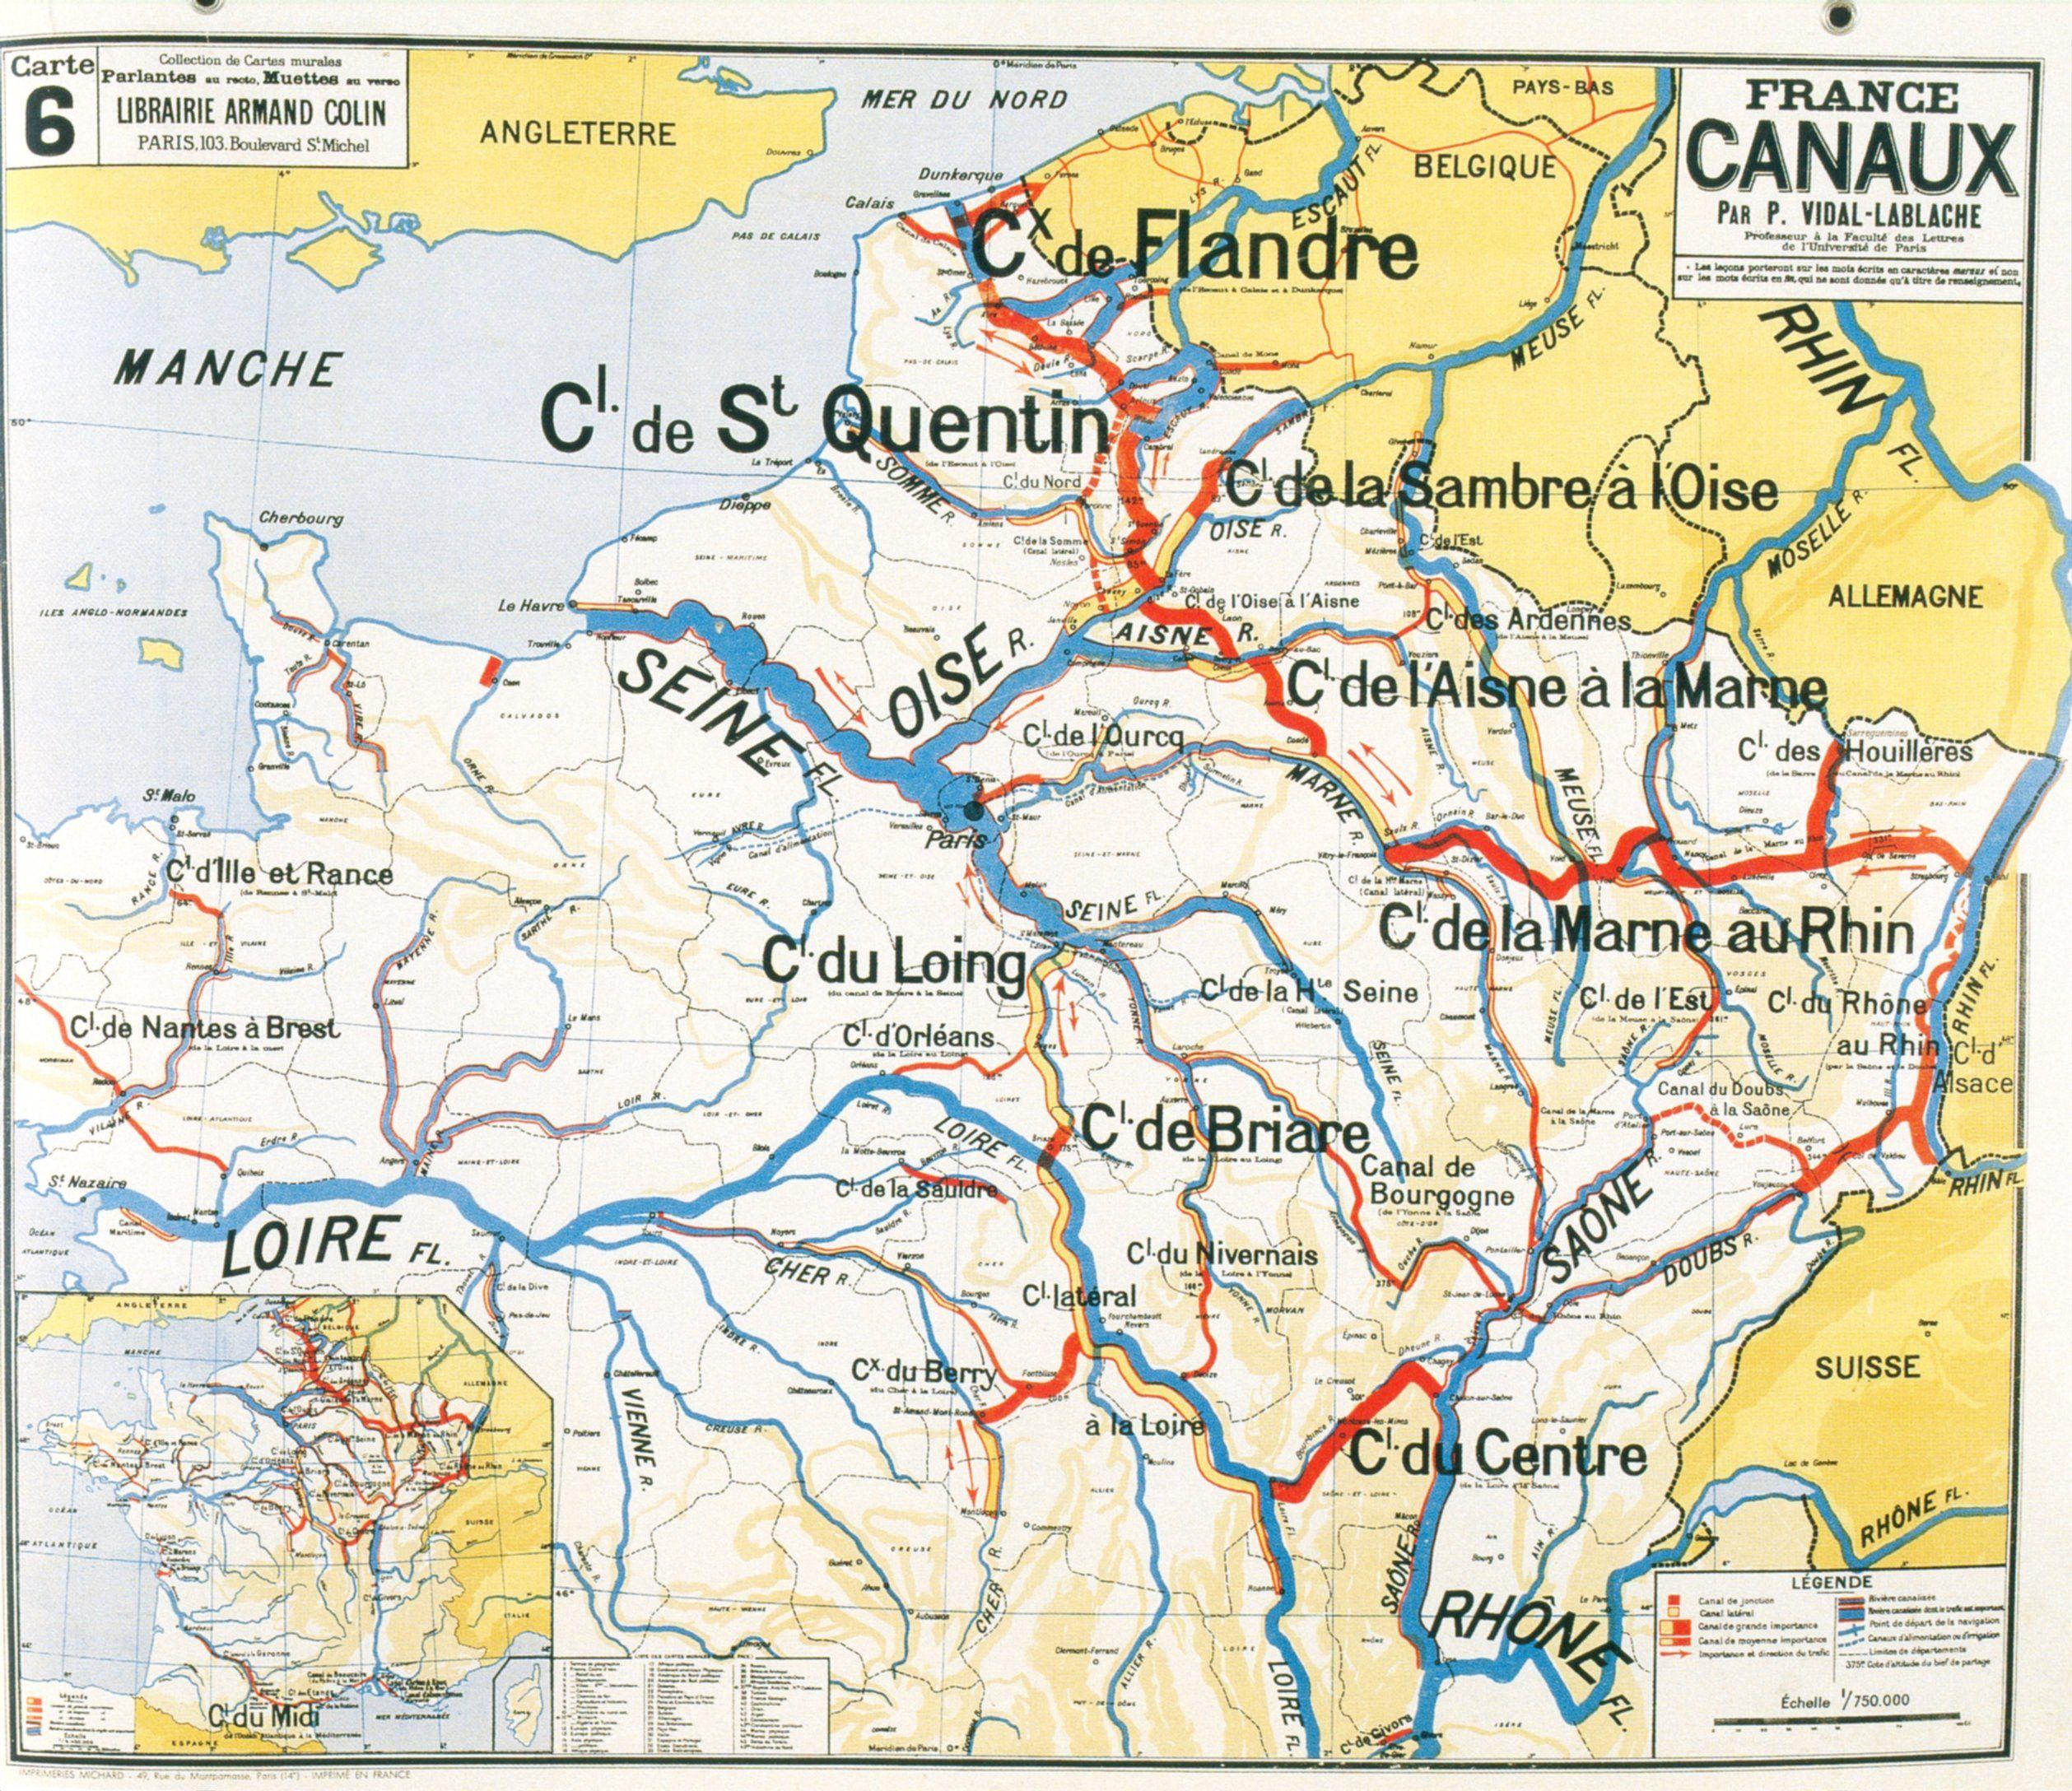 Canaux de France | Old maps